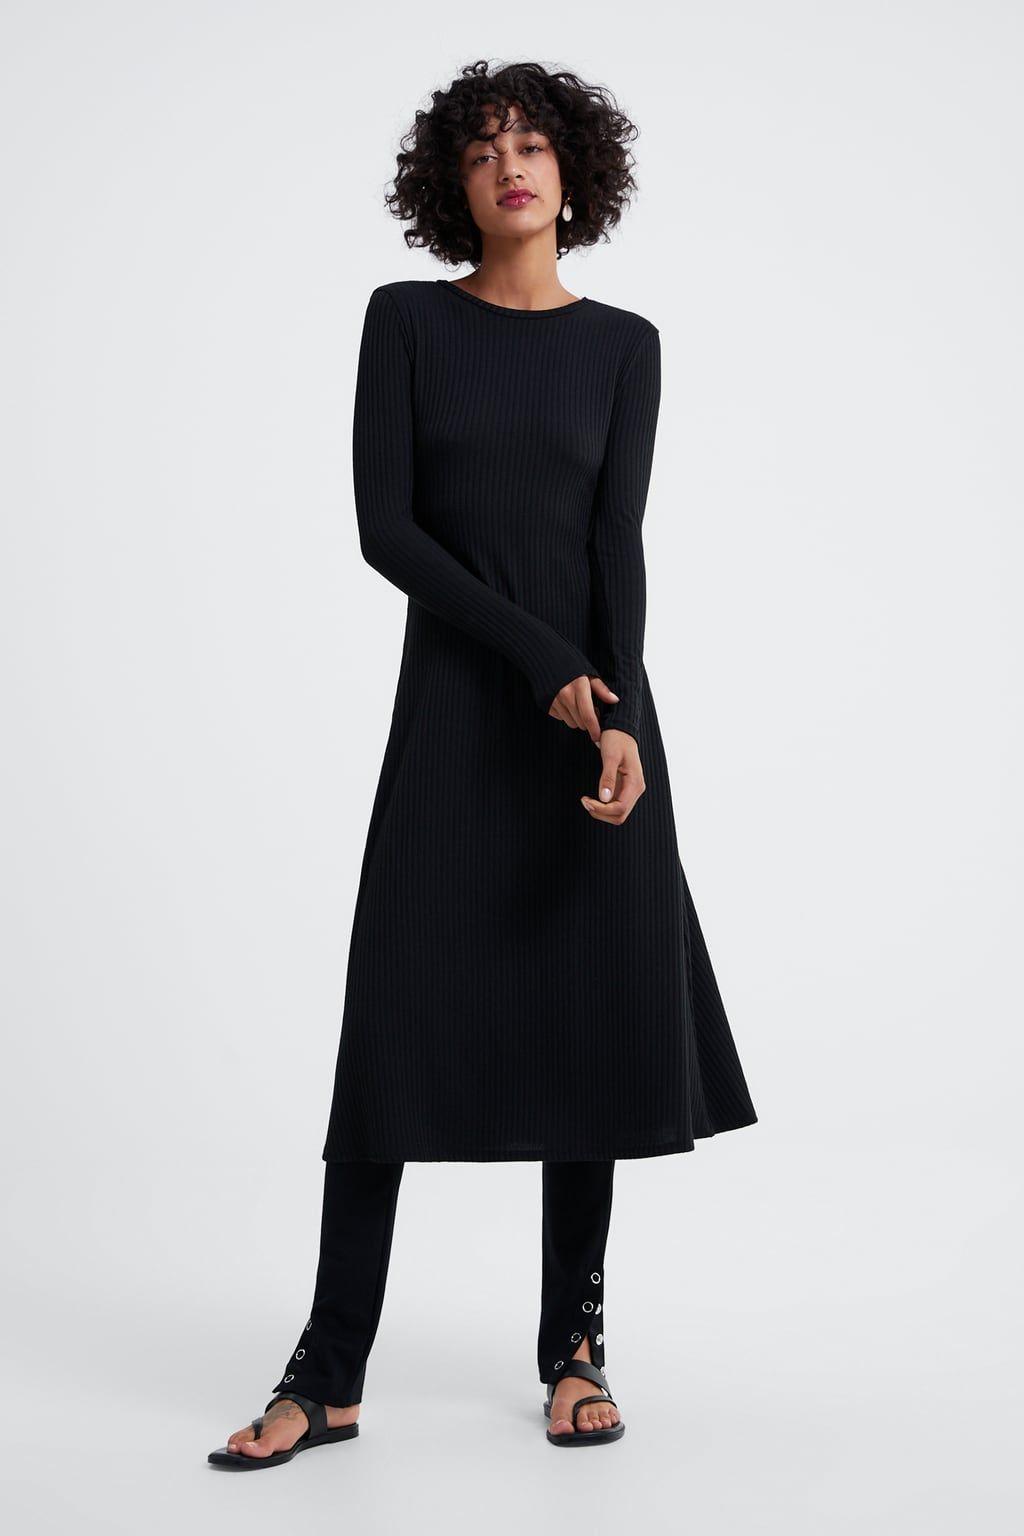 6794b5453f Puffy sleeved dress in 2019